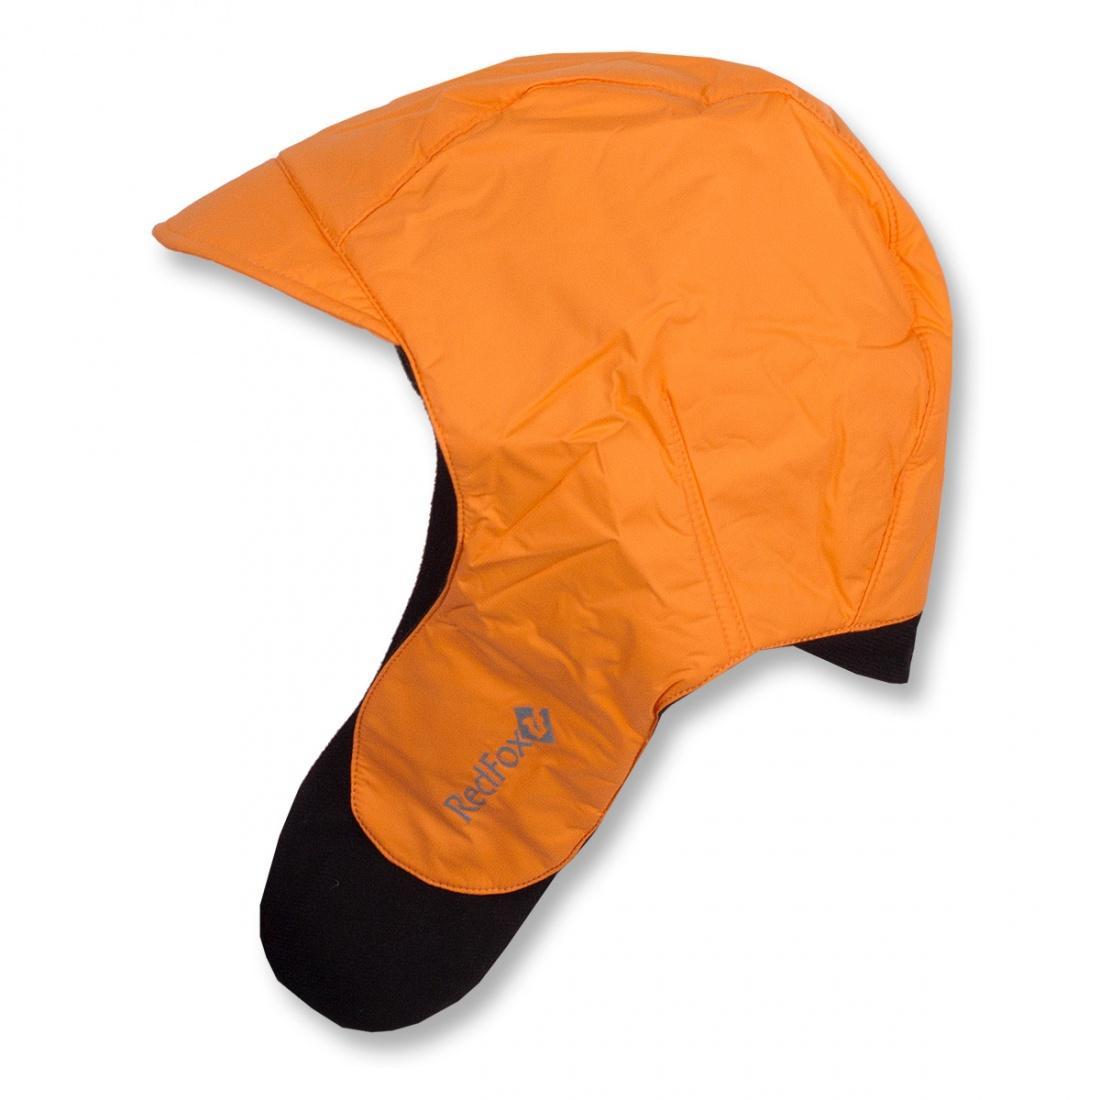 Шапка детская PilotУшанки<br><br> Удобная стильная шапочка для детей от года. <br><br> <br><br><br><br> Материал – Dry Factor 1000.<br><br> <br><br><br> Утеплитель – Omniterm Classic.<br><br> <br>&lt;...<br><br>Цвет: Оранжевый<br>Размер: XL